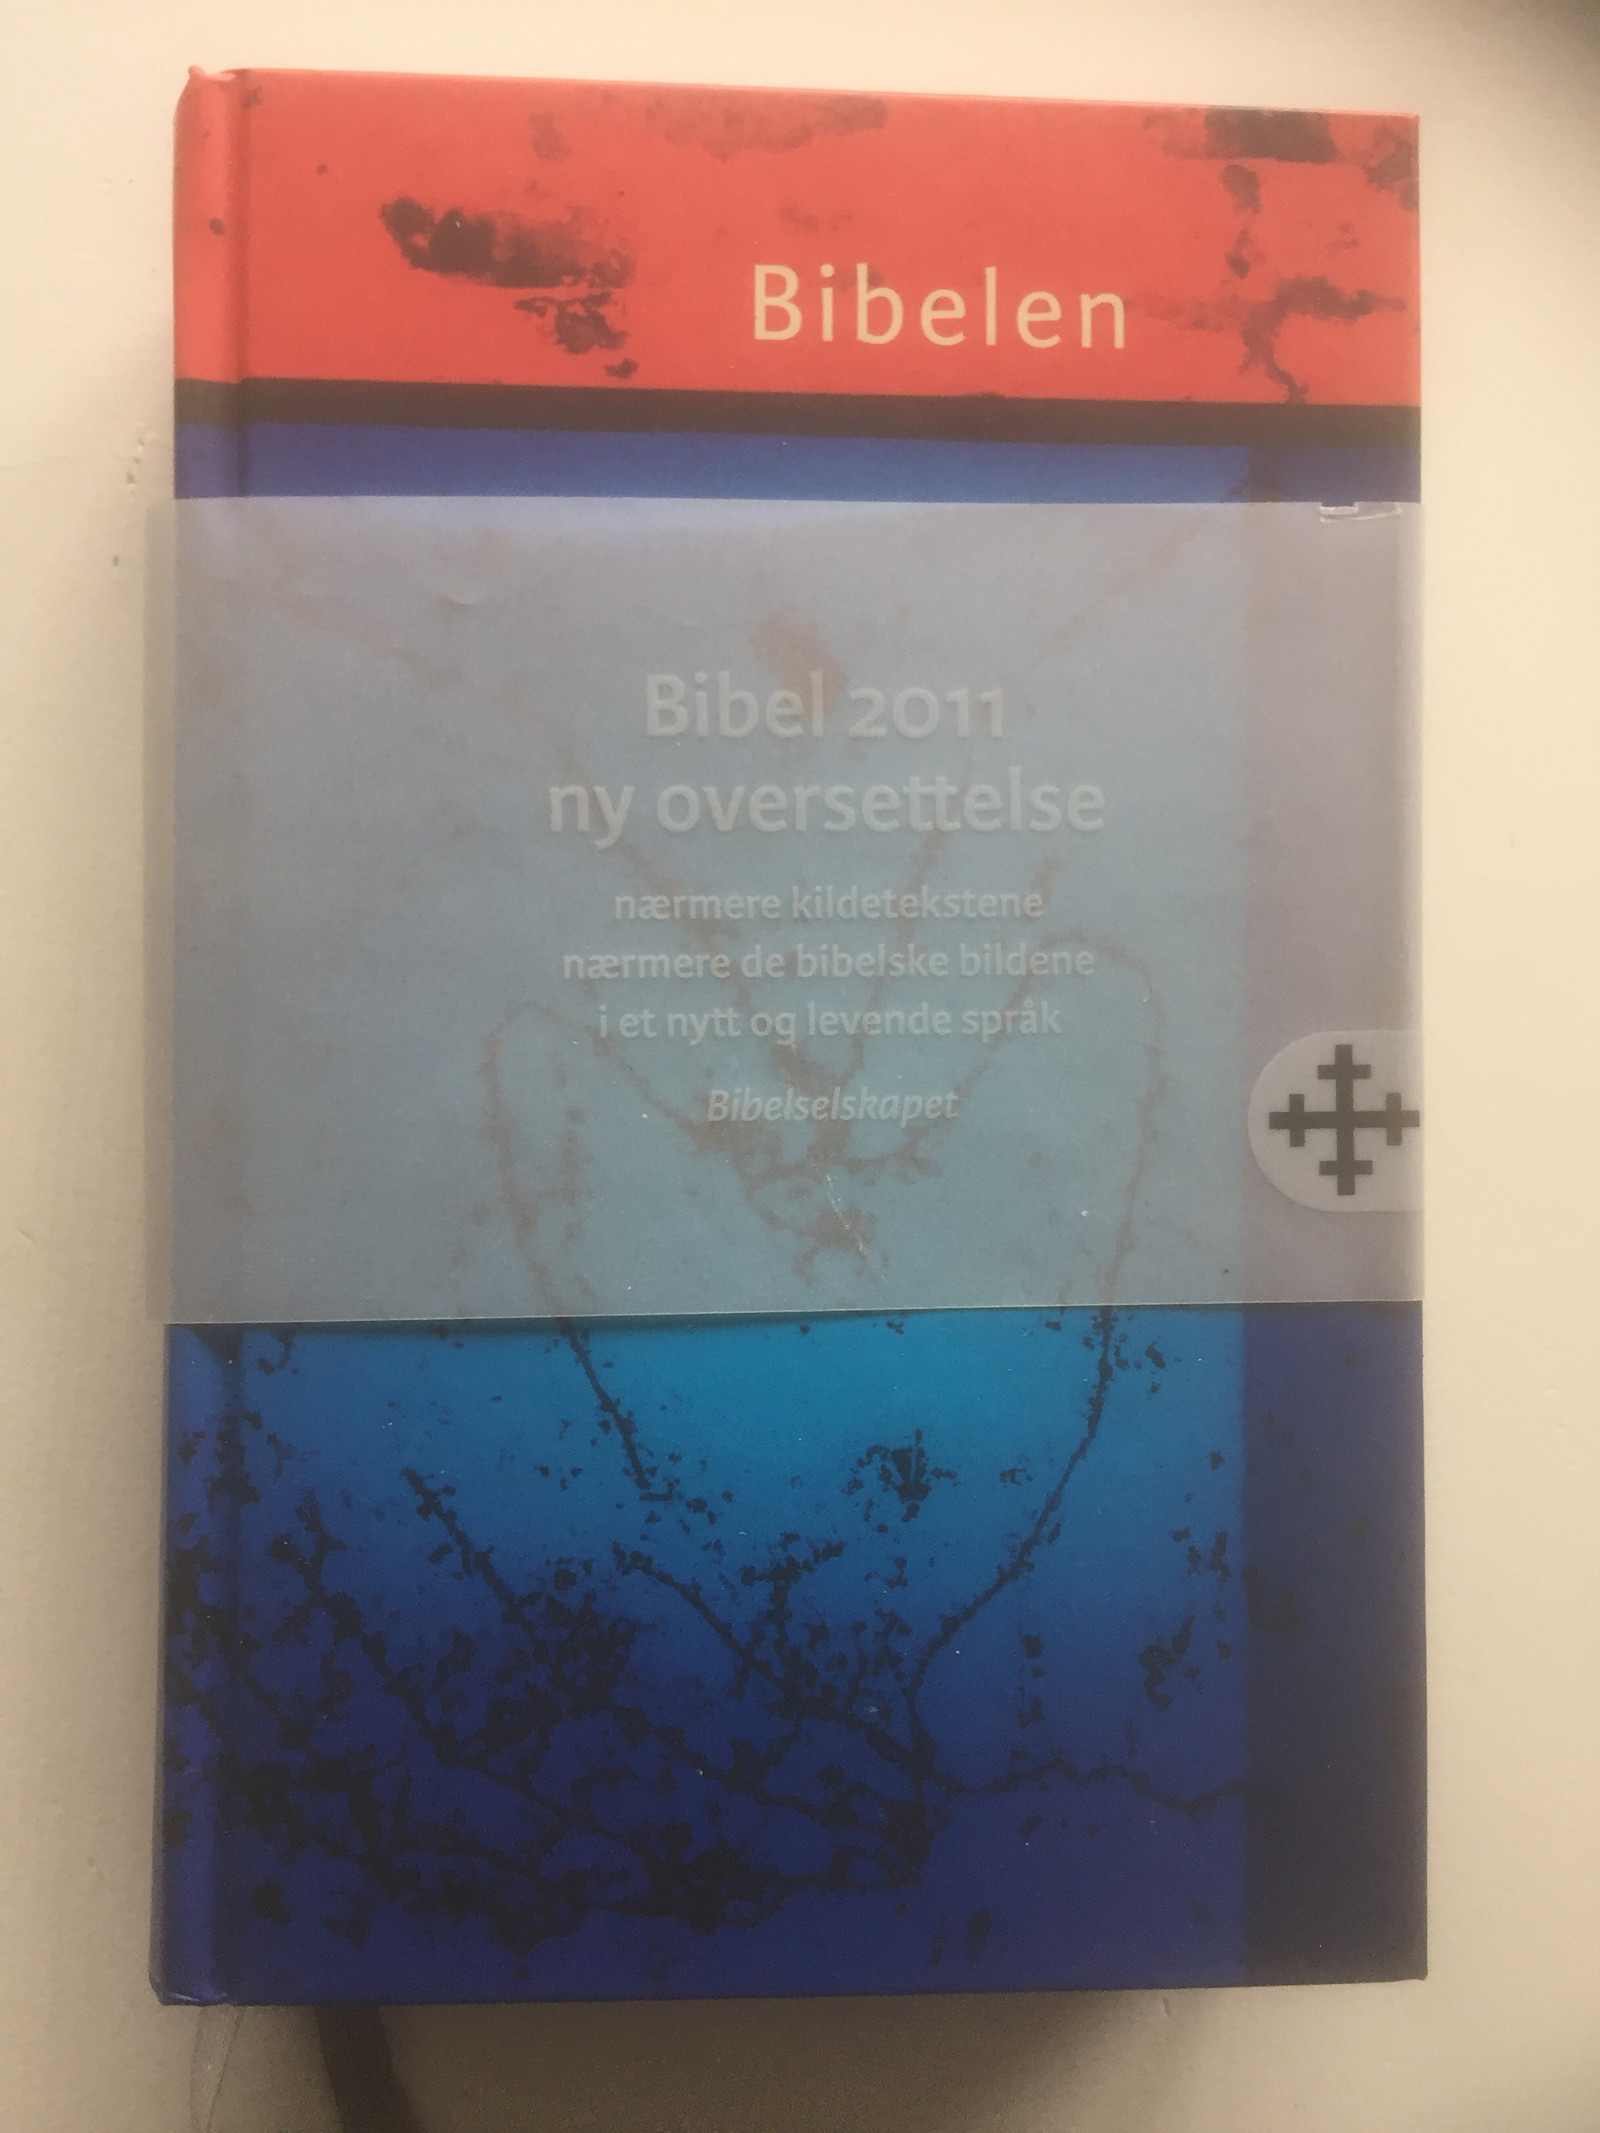 Barnas bibel, bibel ordbok, Barnebibel, Eldre religiøs